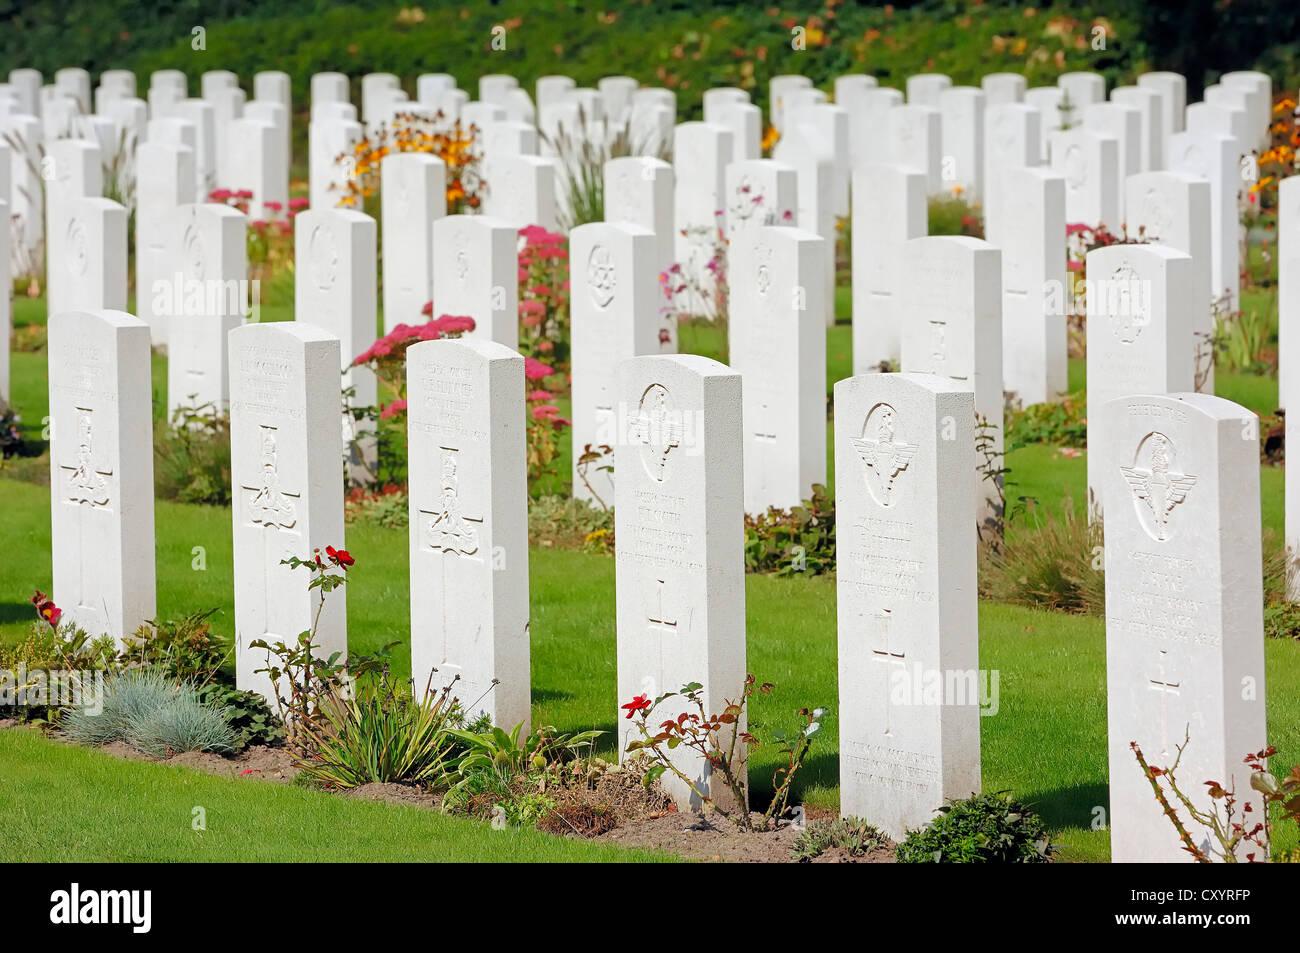 Grave stones in Airborne Cemetery, Arnhem Oosterbeek War Cemetery, Oosterbeek, Arnhem, Gelderland, Netherlands, - Stock Image